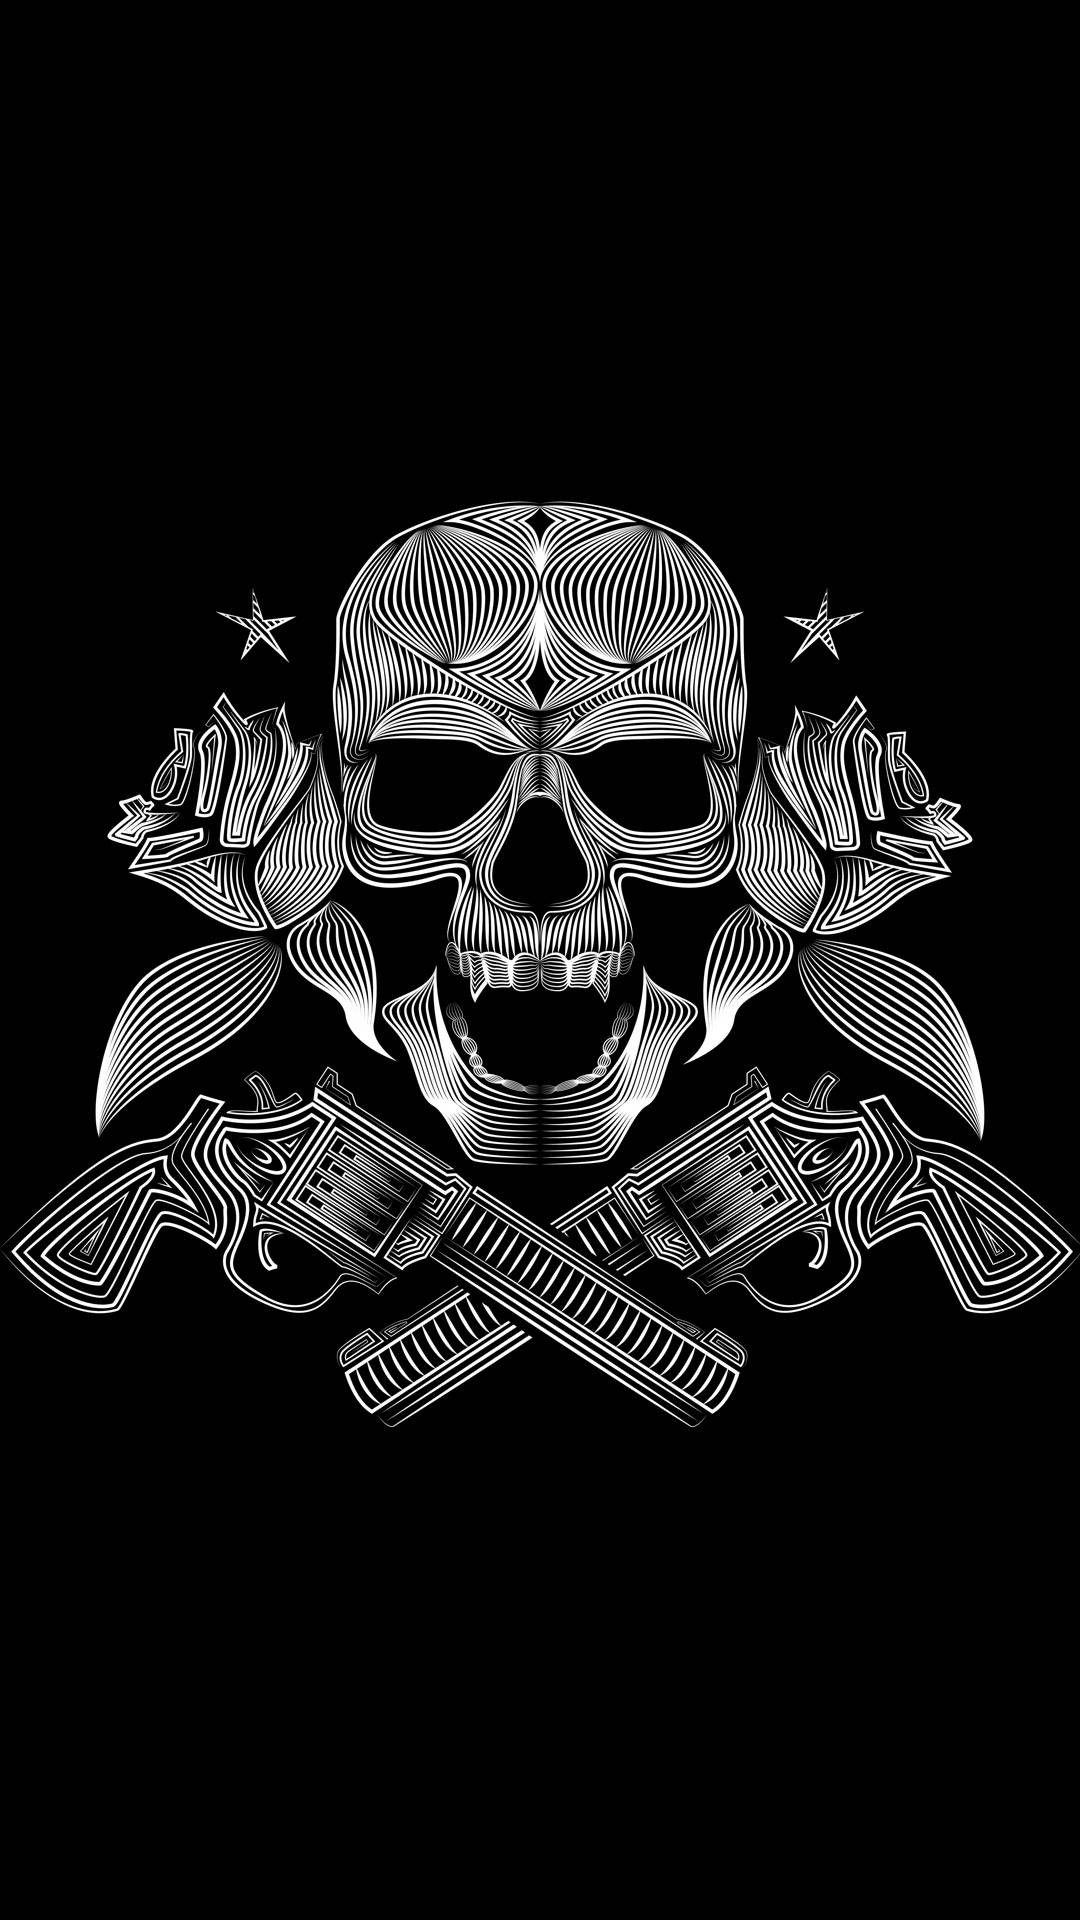 Pin by Kimberly Thorsen on I Skulls Guns wallpaper